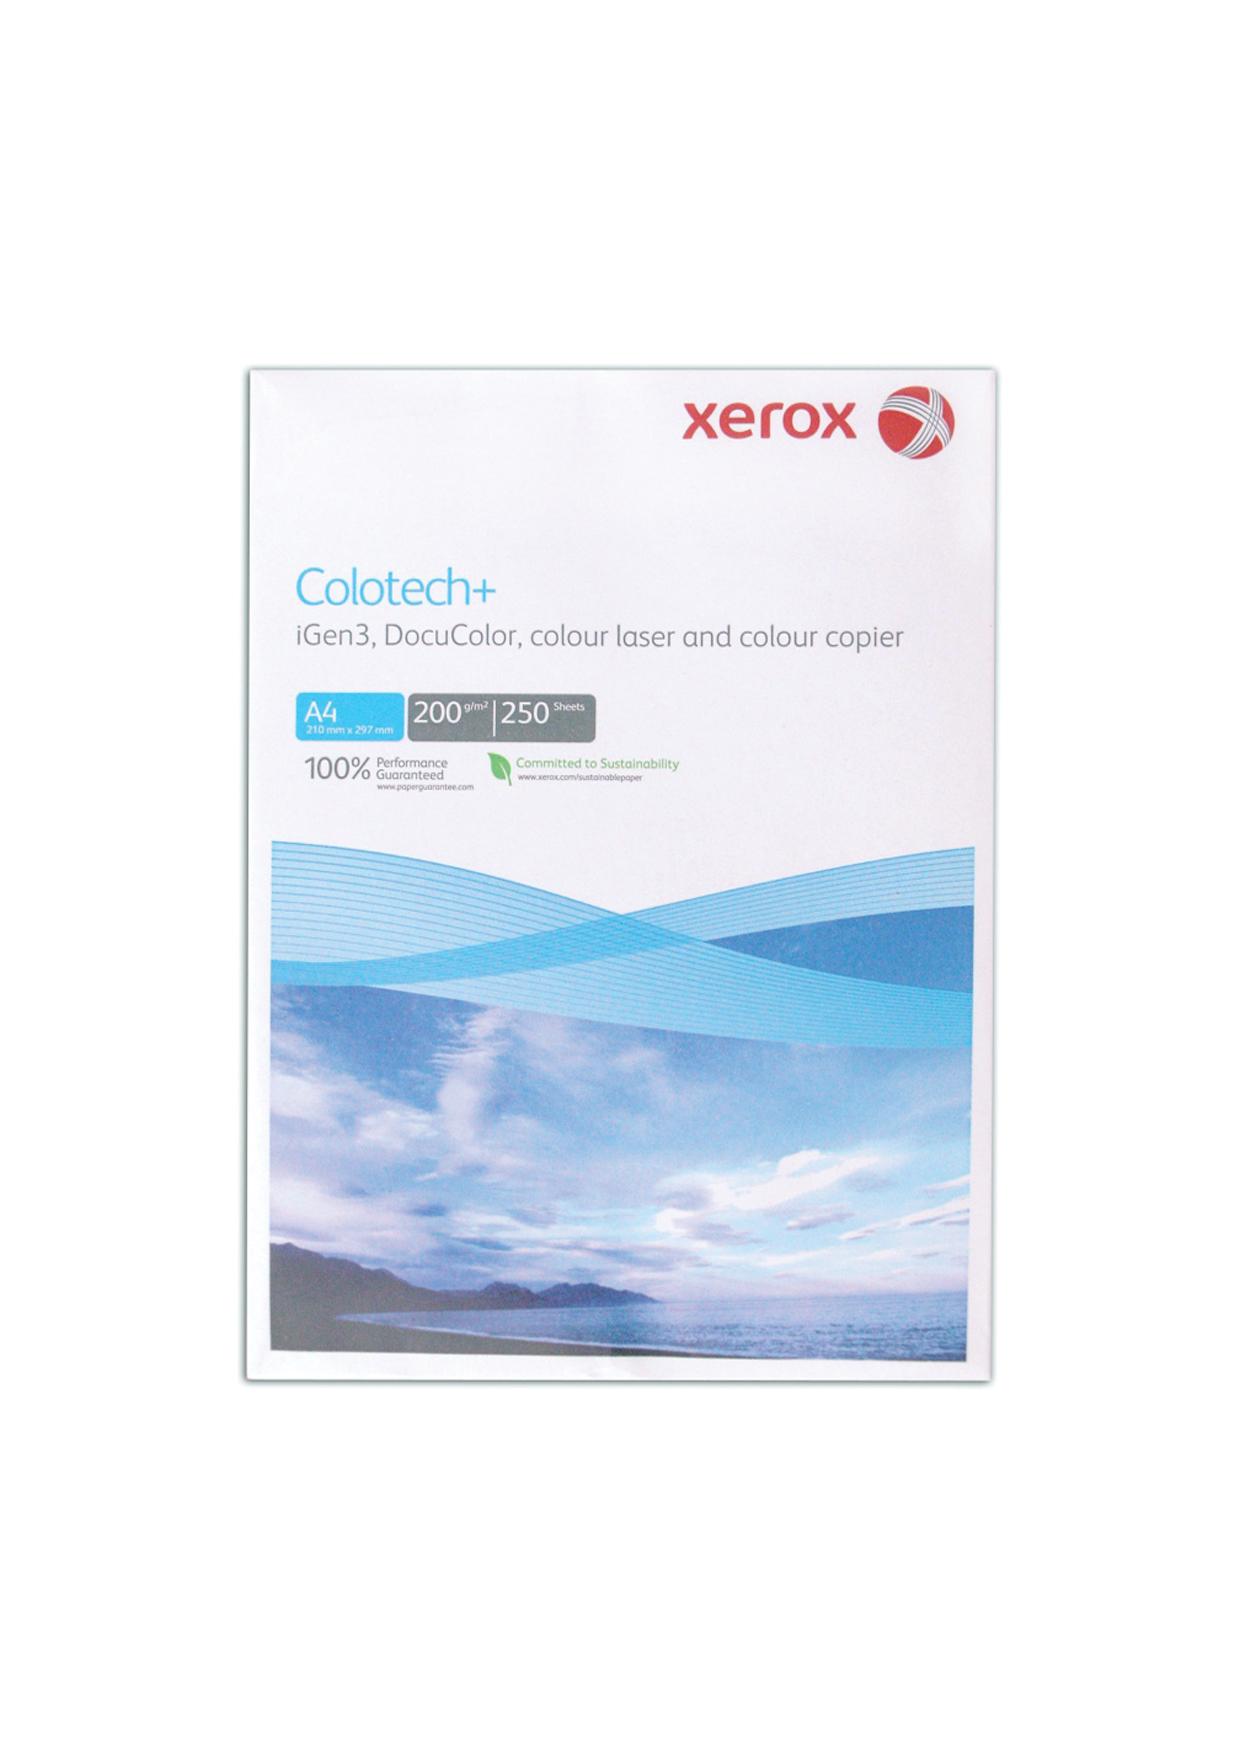 Копирна хартия Xerox Colotech+ A4, 500 листа, 90g/m2, 160 CIE